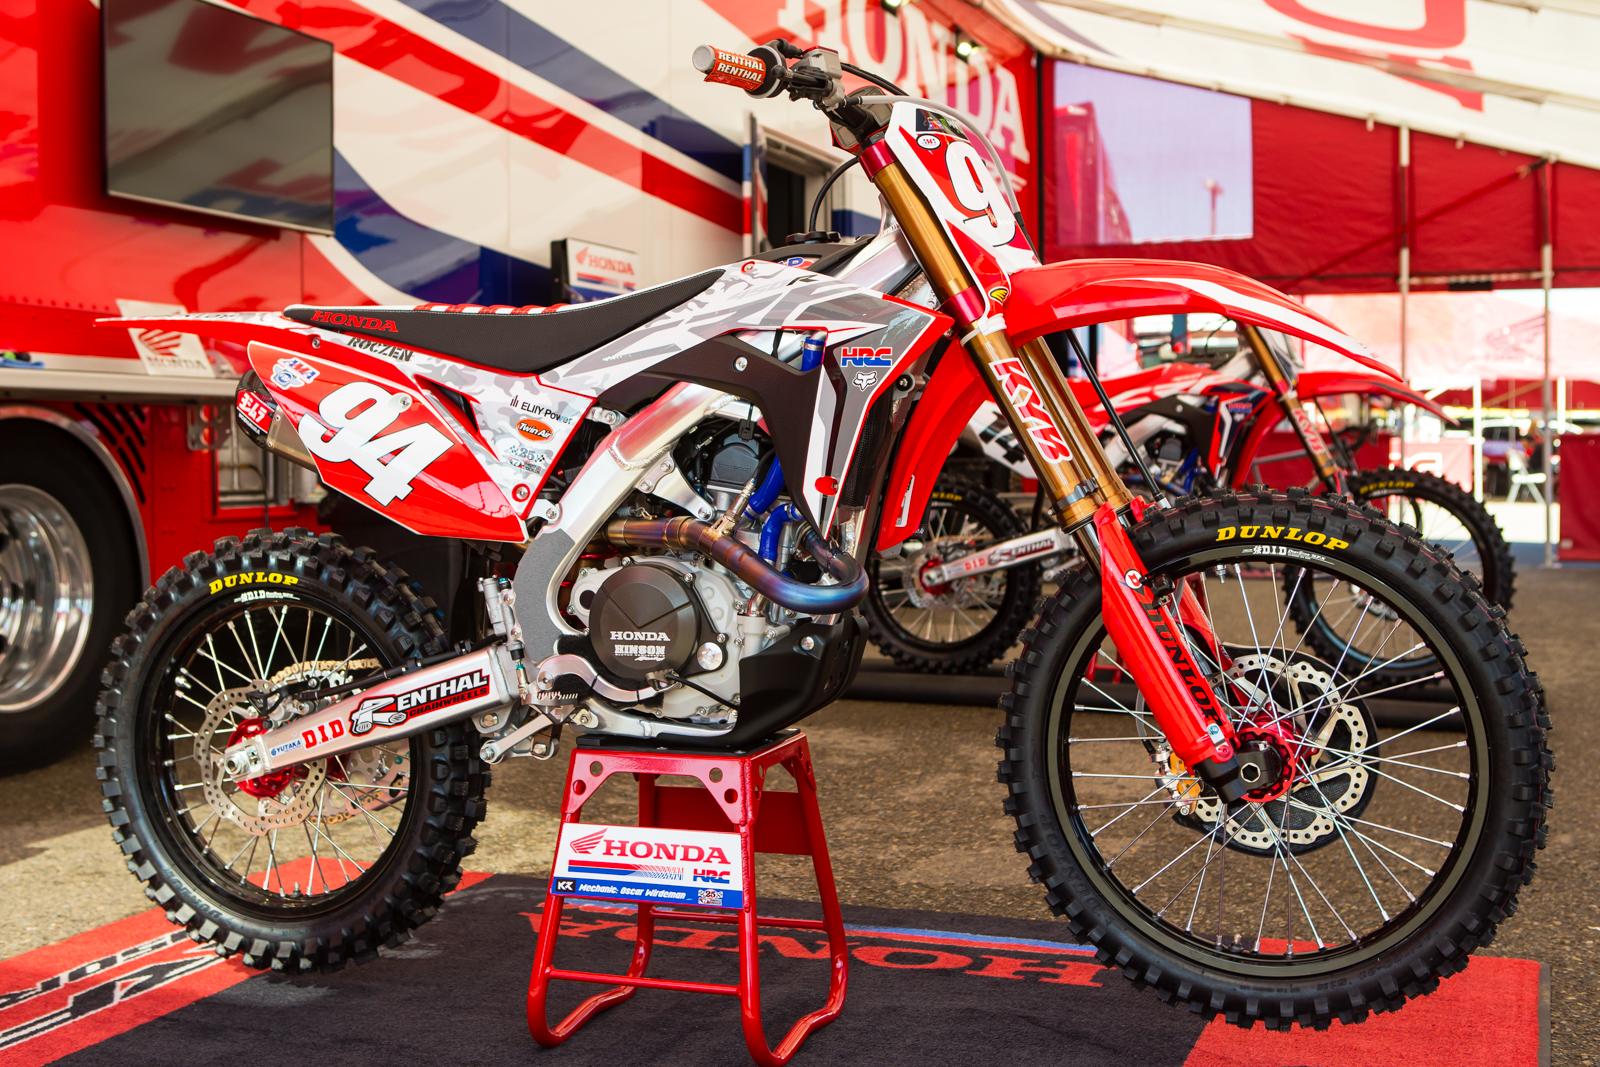 Honda Dealer San Diego >> Ken Roczen's White Camo - Vital MX Pit Bits: San Diego - Motocross Pictures - Vital MX